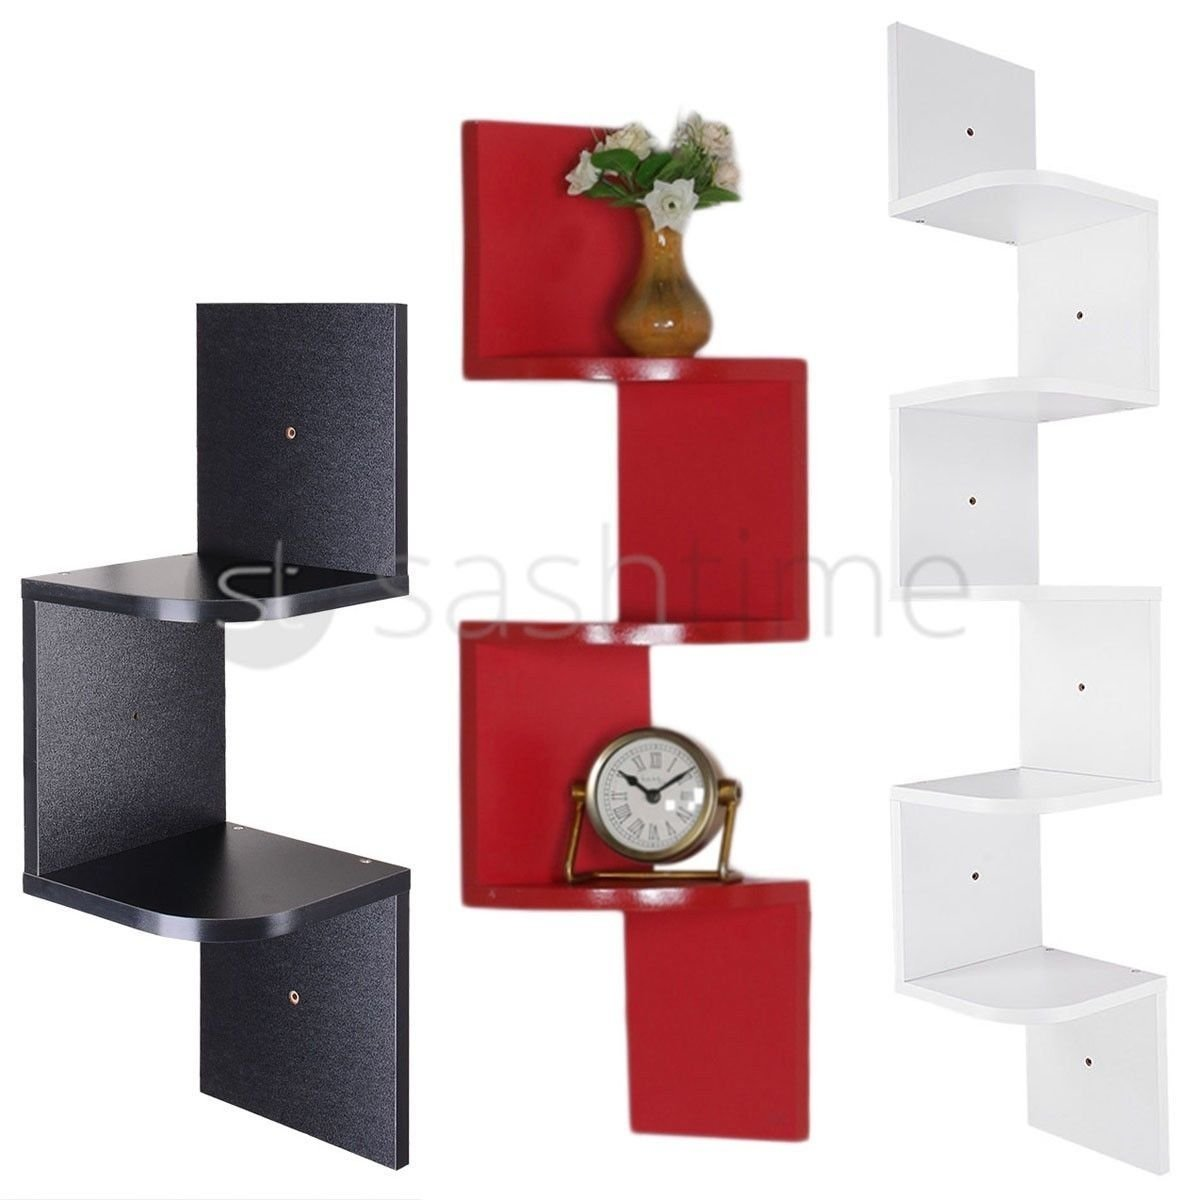 FiNeWaY Durable MDF Zigzag Corner Wall Wooden Floating Display Shelf Shelves Storage Rack (RED, 2 TIER)